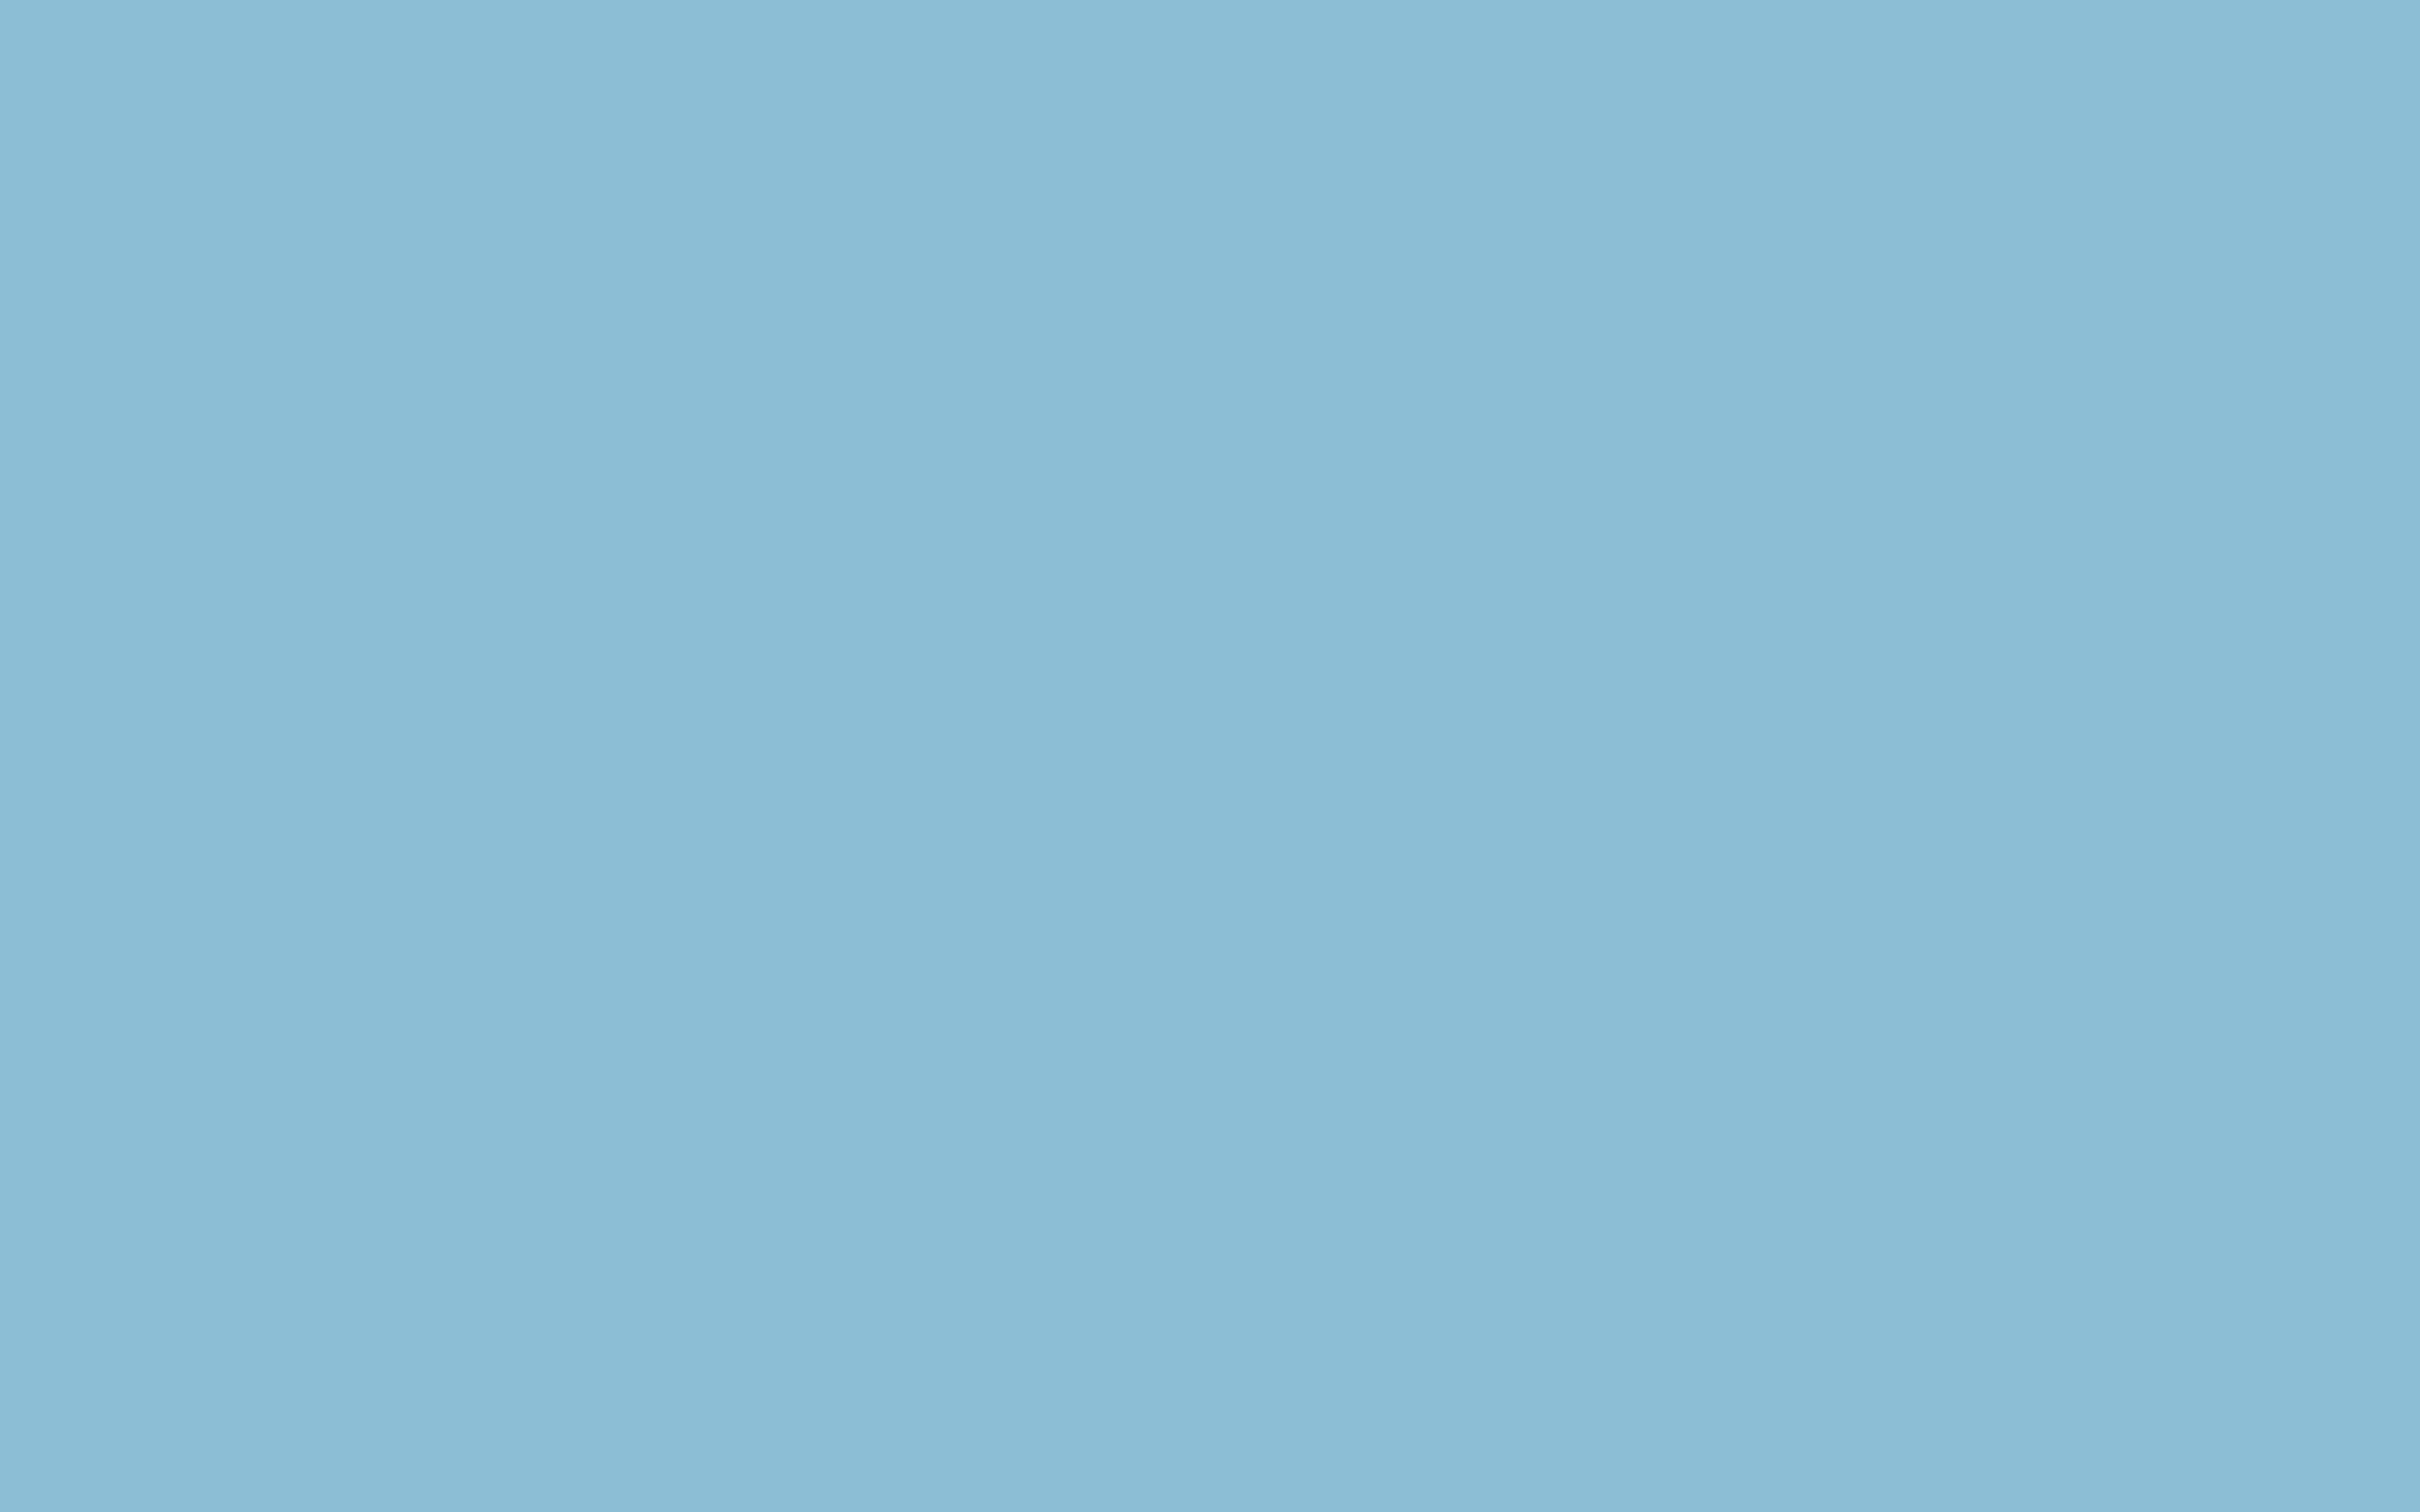 2560x1600 Dark Sky Blue Solid Color Background